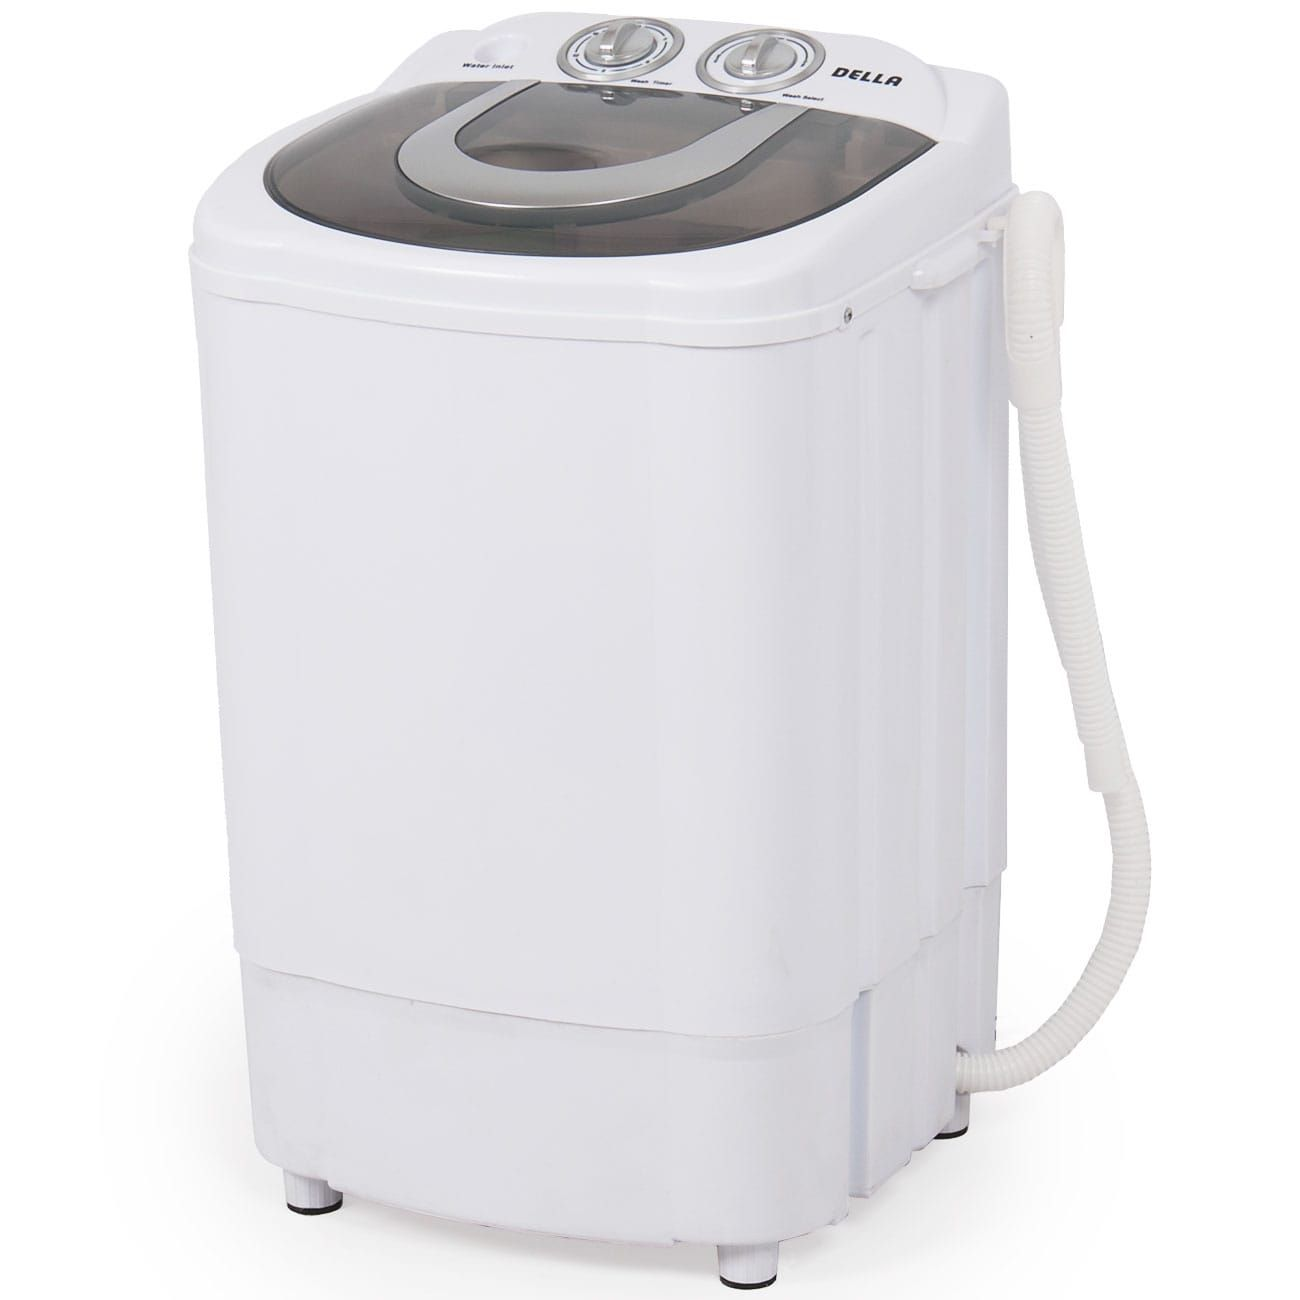 Della Mini Portable Washing Machine Spin Wash 8 8 Lbs Capacity